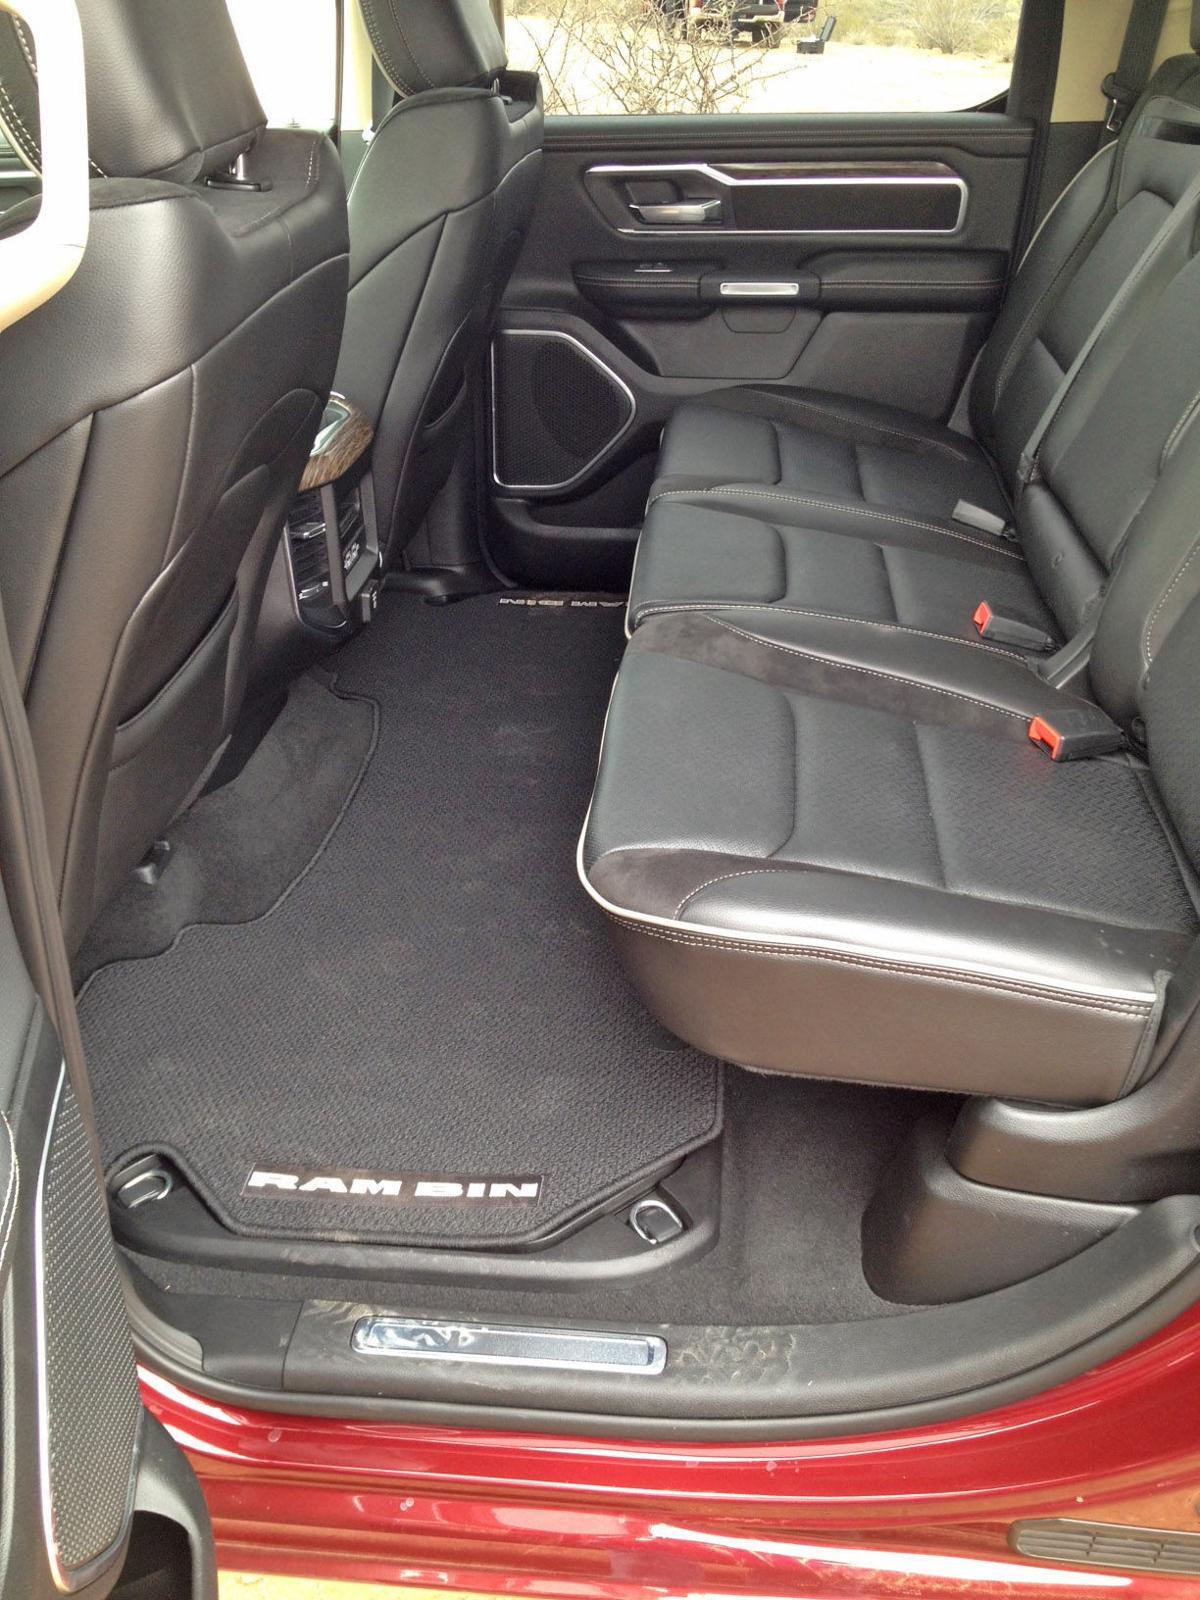 ram hauls new looks capability cars. Black Bedroom Furniture Sets. Home Design Ideas